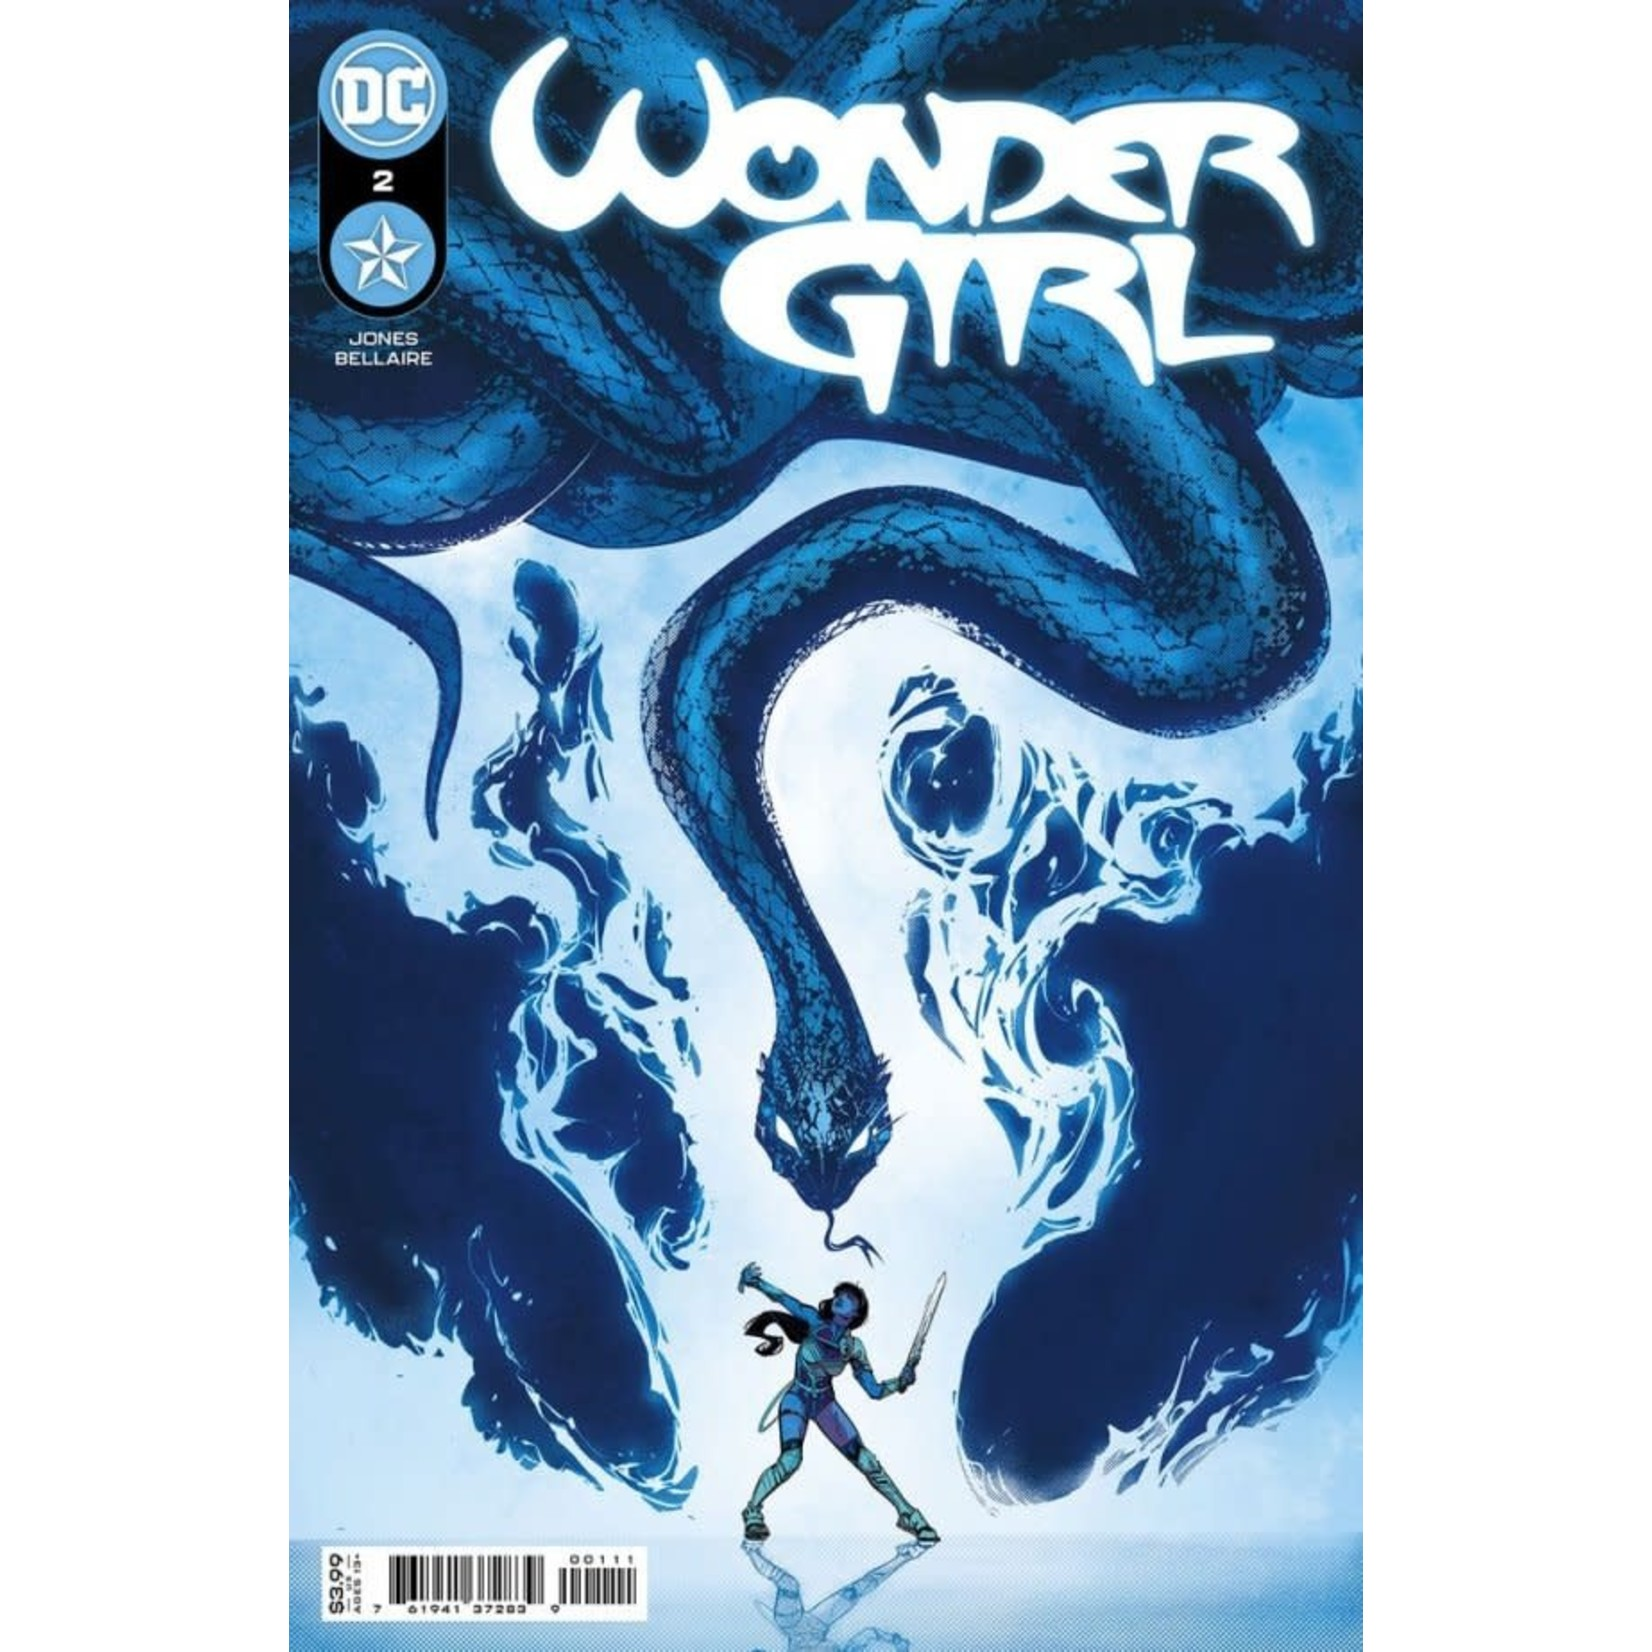 DC Comics Wonder Girl #2